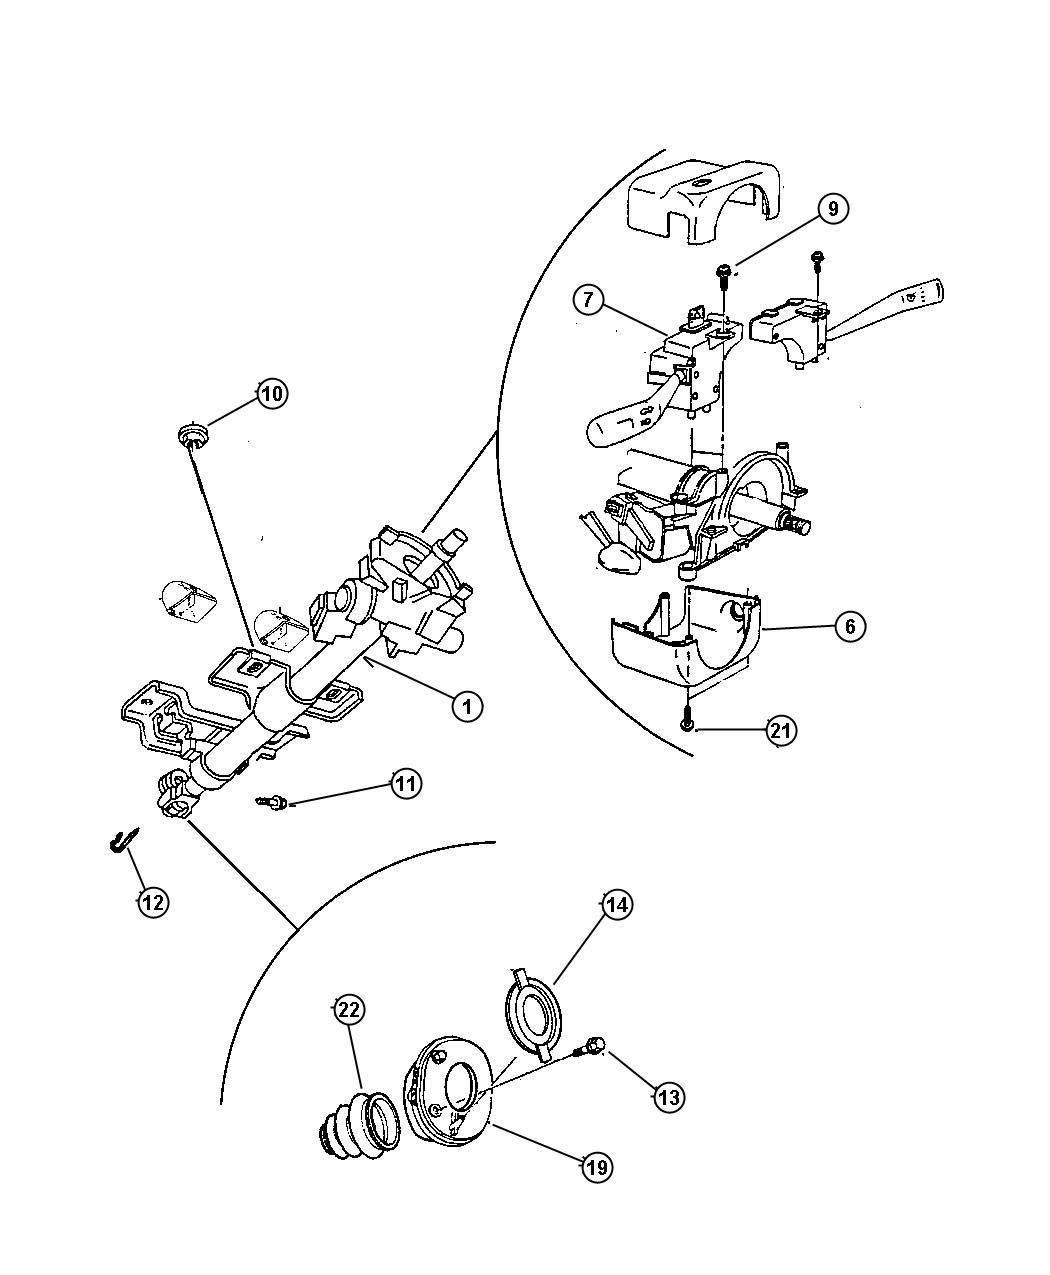 Dodge Neon Column Steering Tilt With Automatic Abb